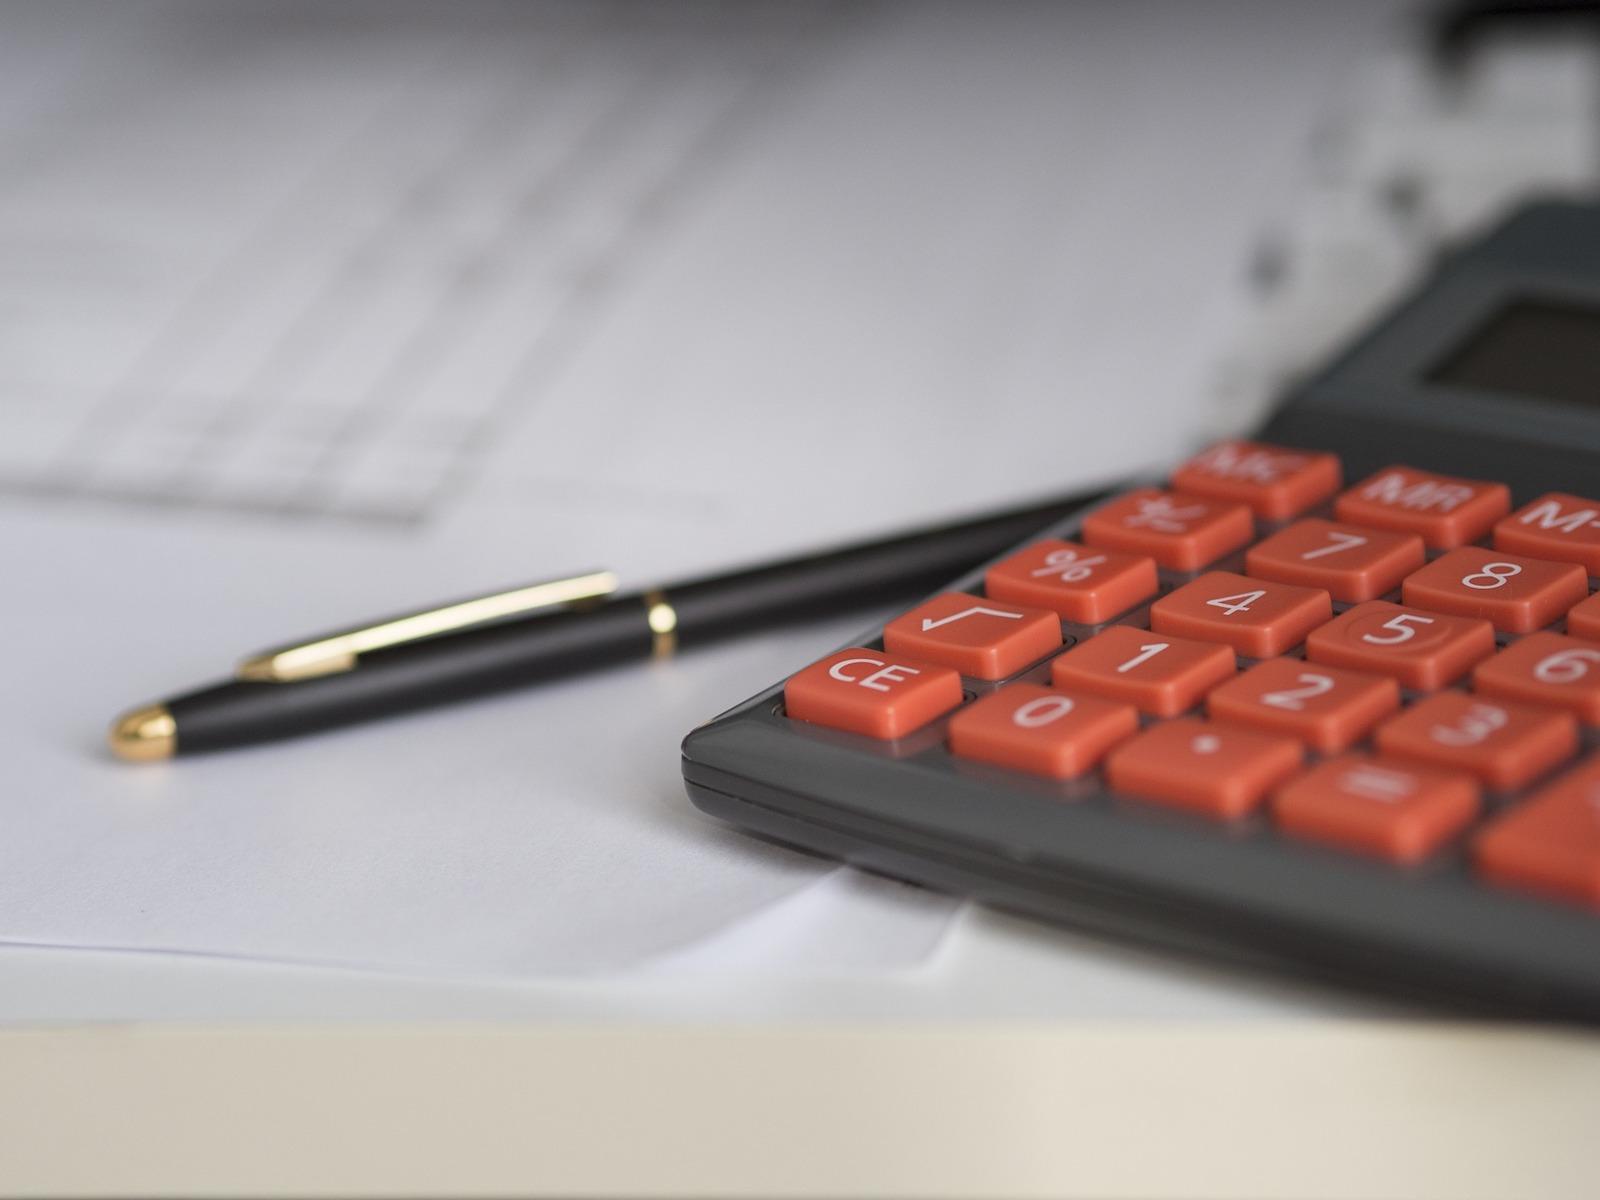 Kalkulator Rentowności Najmu Blog Listaprzetargowpl